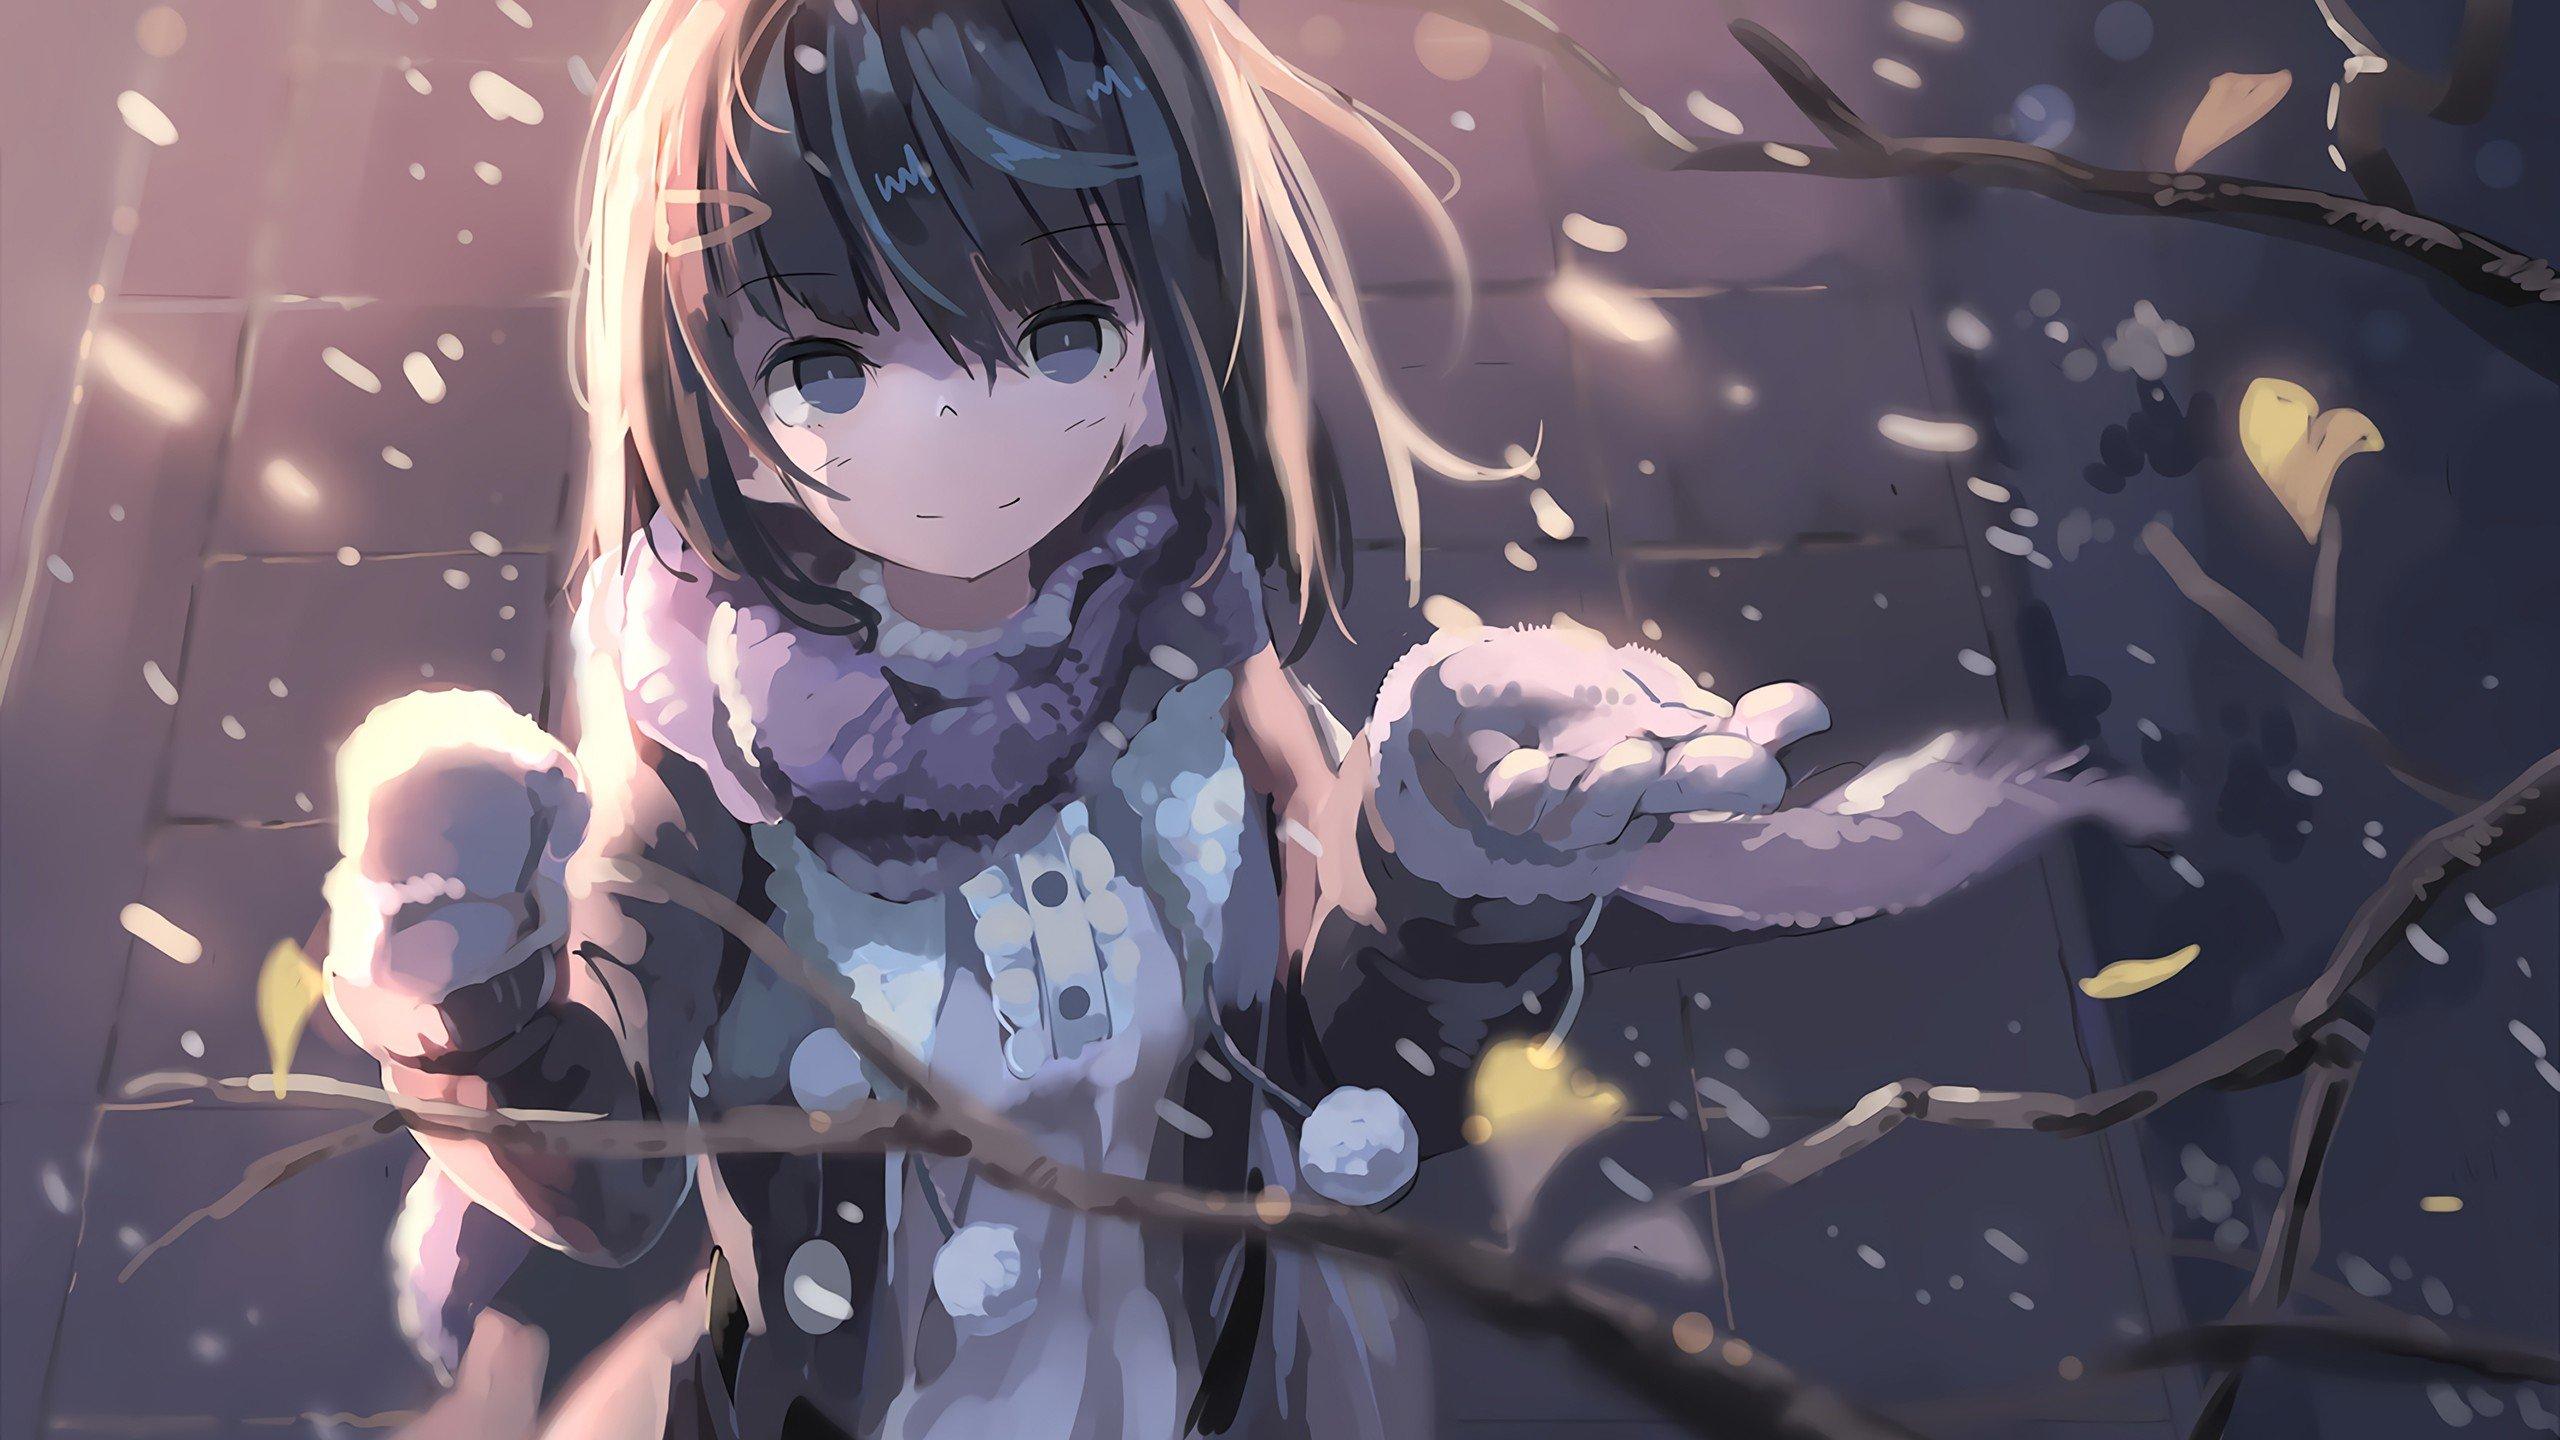 Wallpaper 2560x1440 Px Anime Girls Original Characters Winter